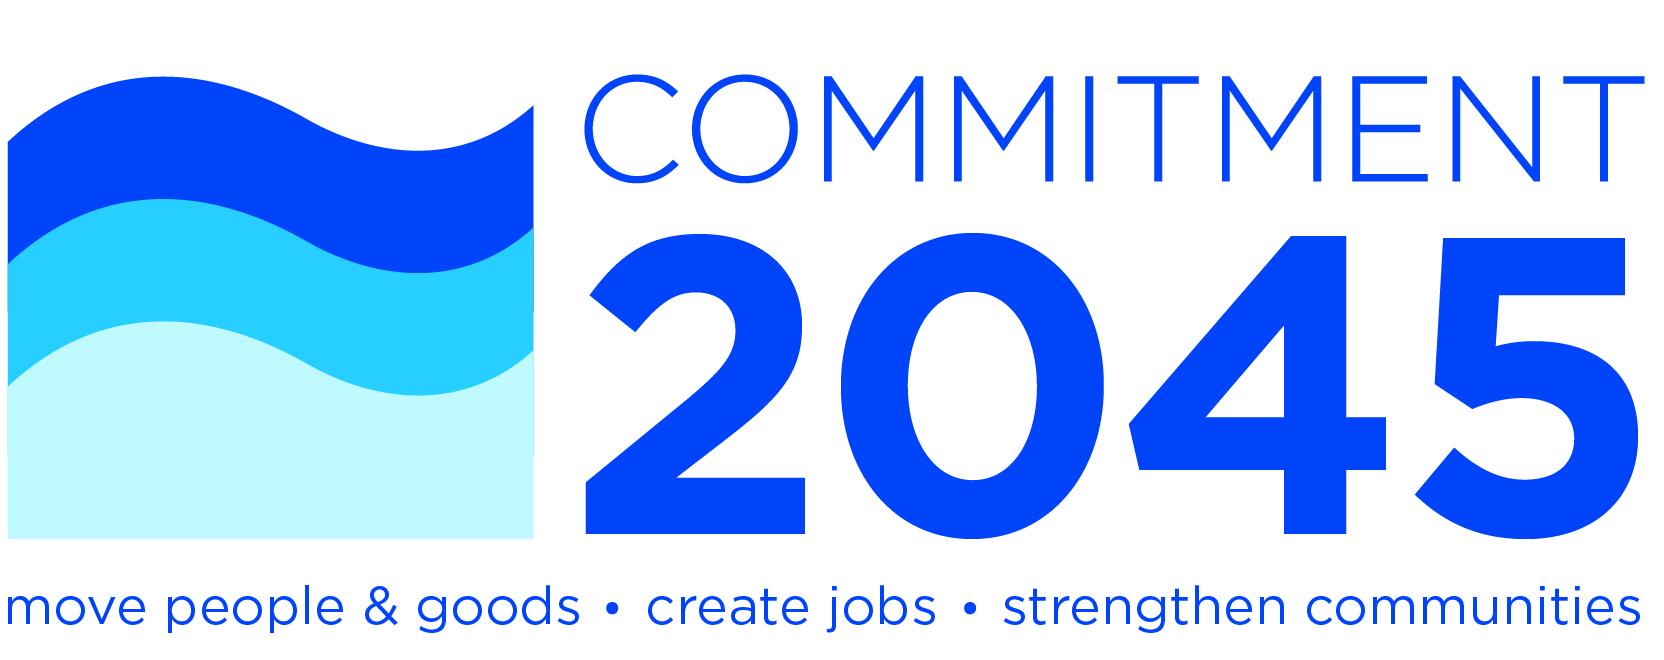 2045 LRTP logo UpdateTagLine